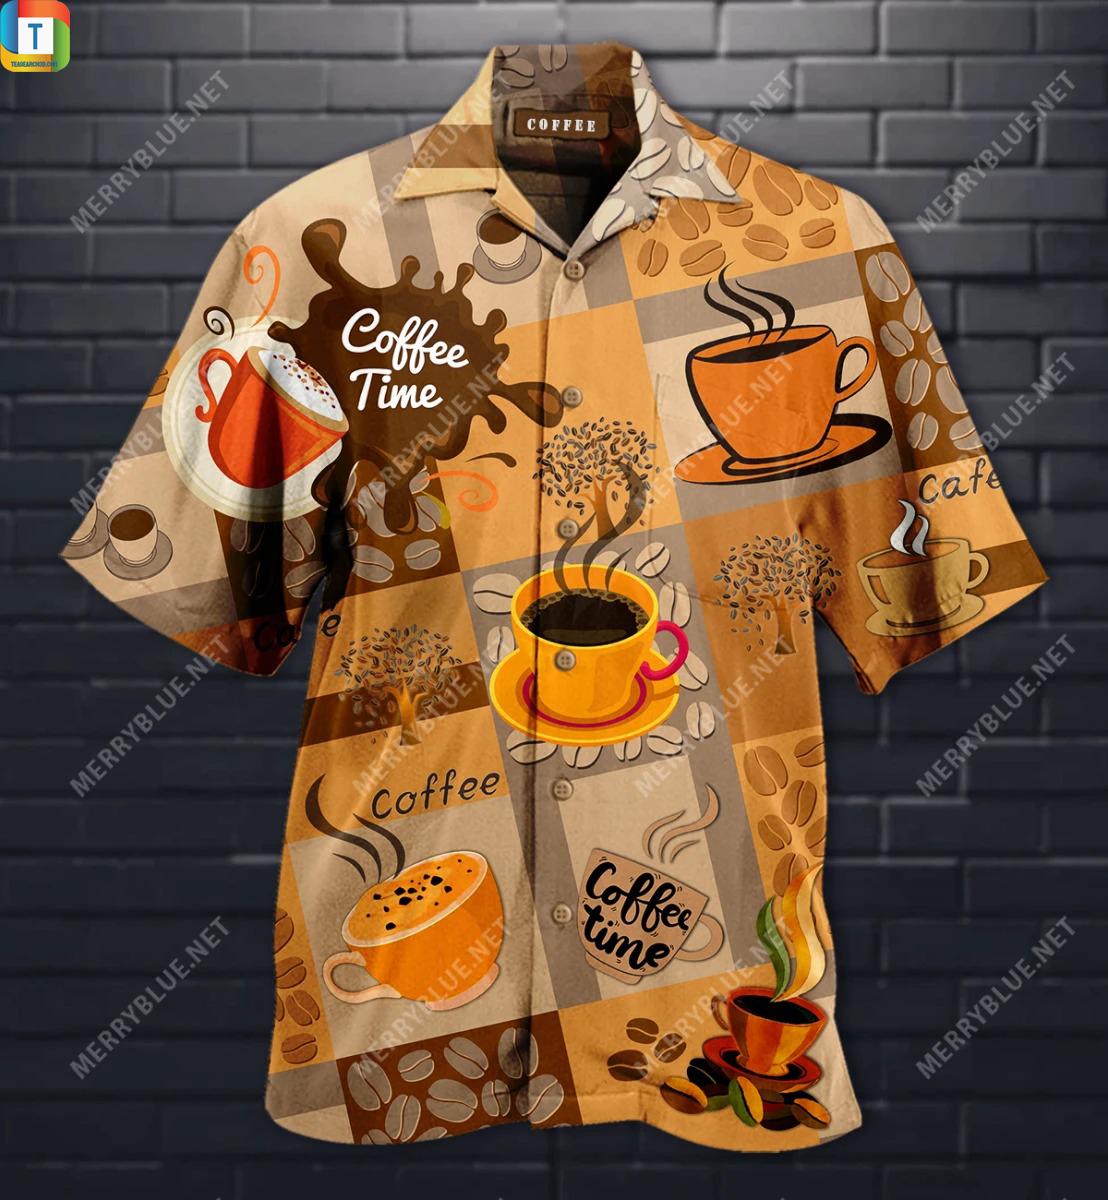 Coffee time makes life better hawaiian shirt 1